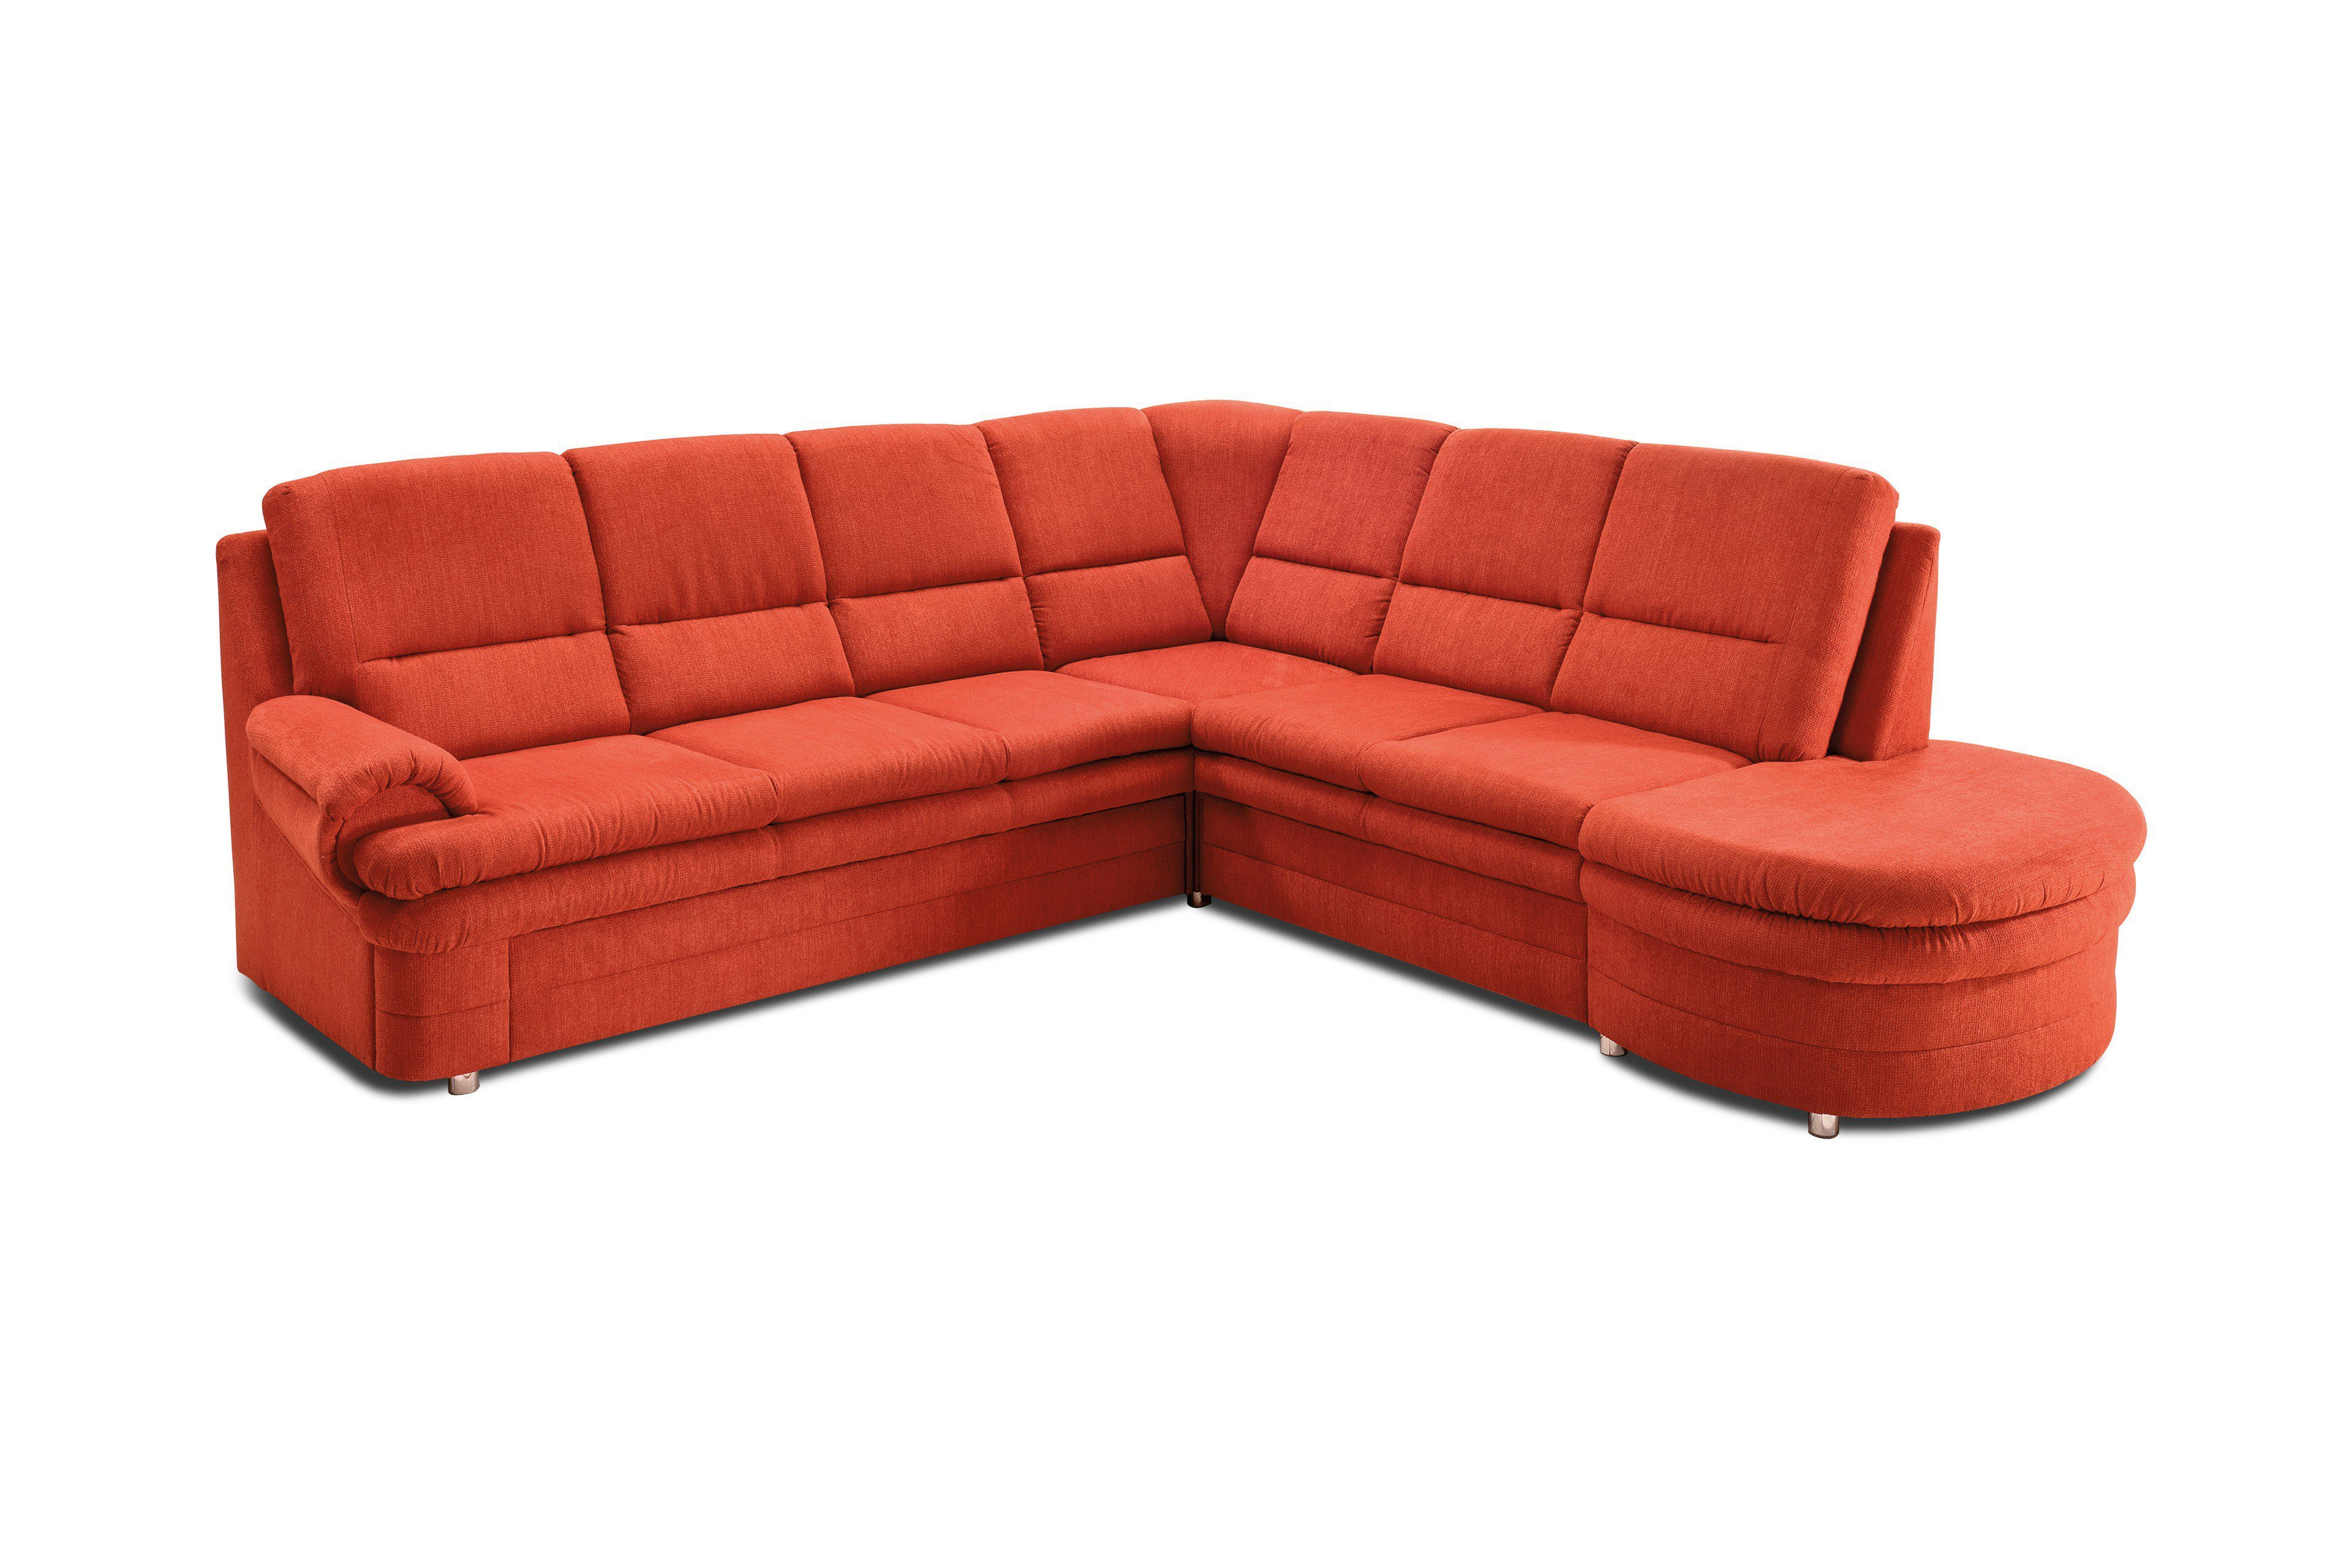 Benformato caneda ecksofa rot m bel letz ihr online shop for Ecksofa terracotta